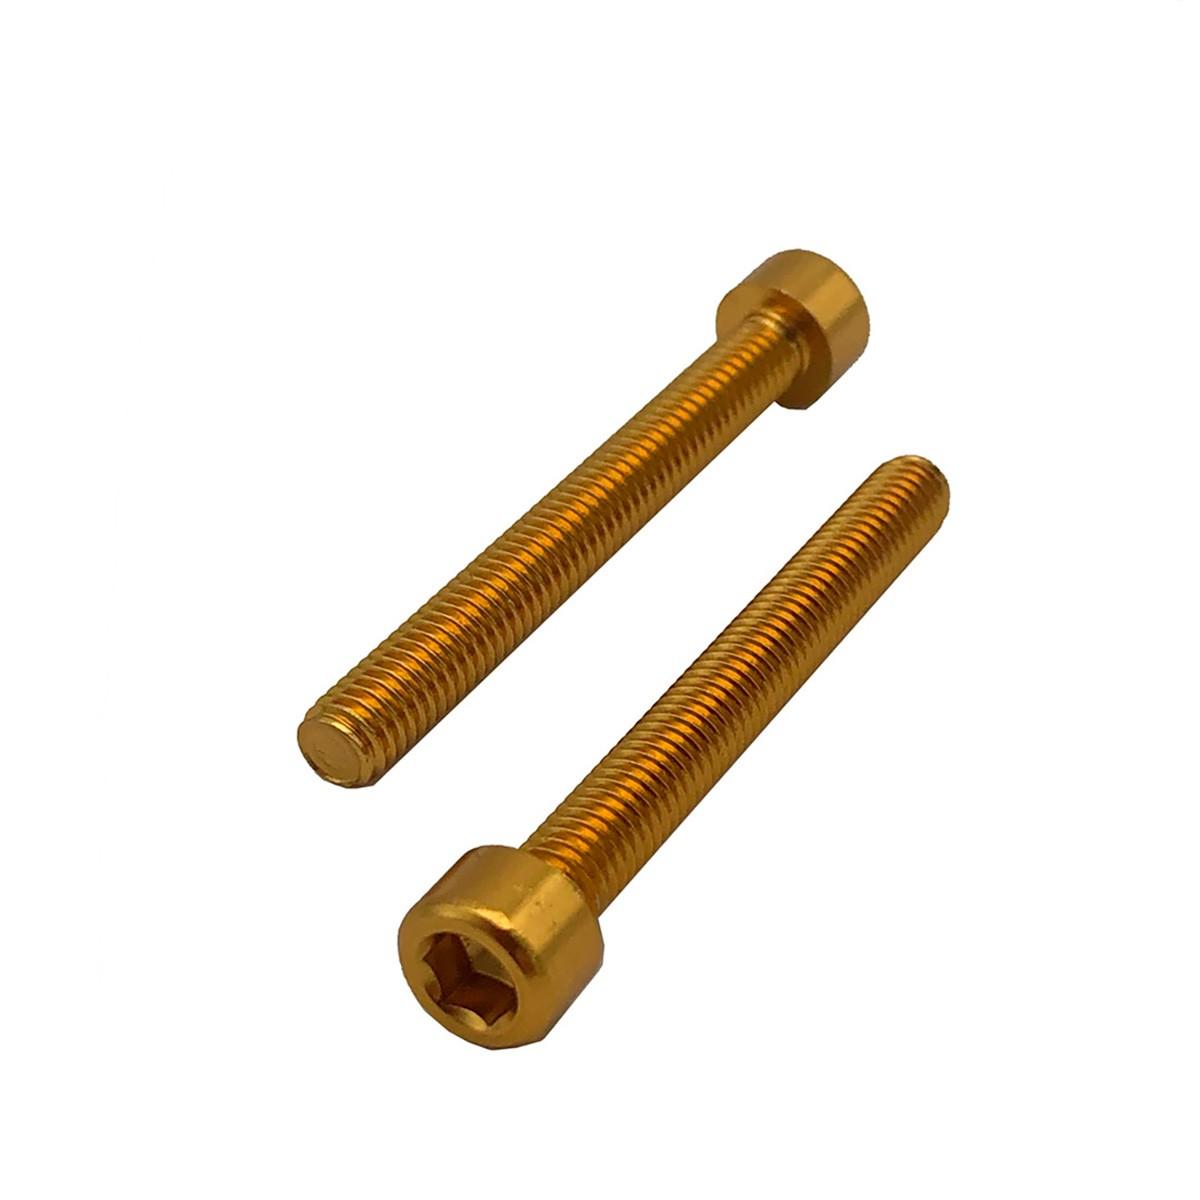 Parafuso Allen de Aluminio Socket Cap M6 x 30mm Dourado